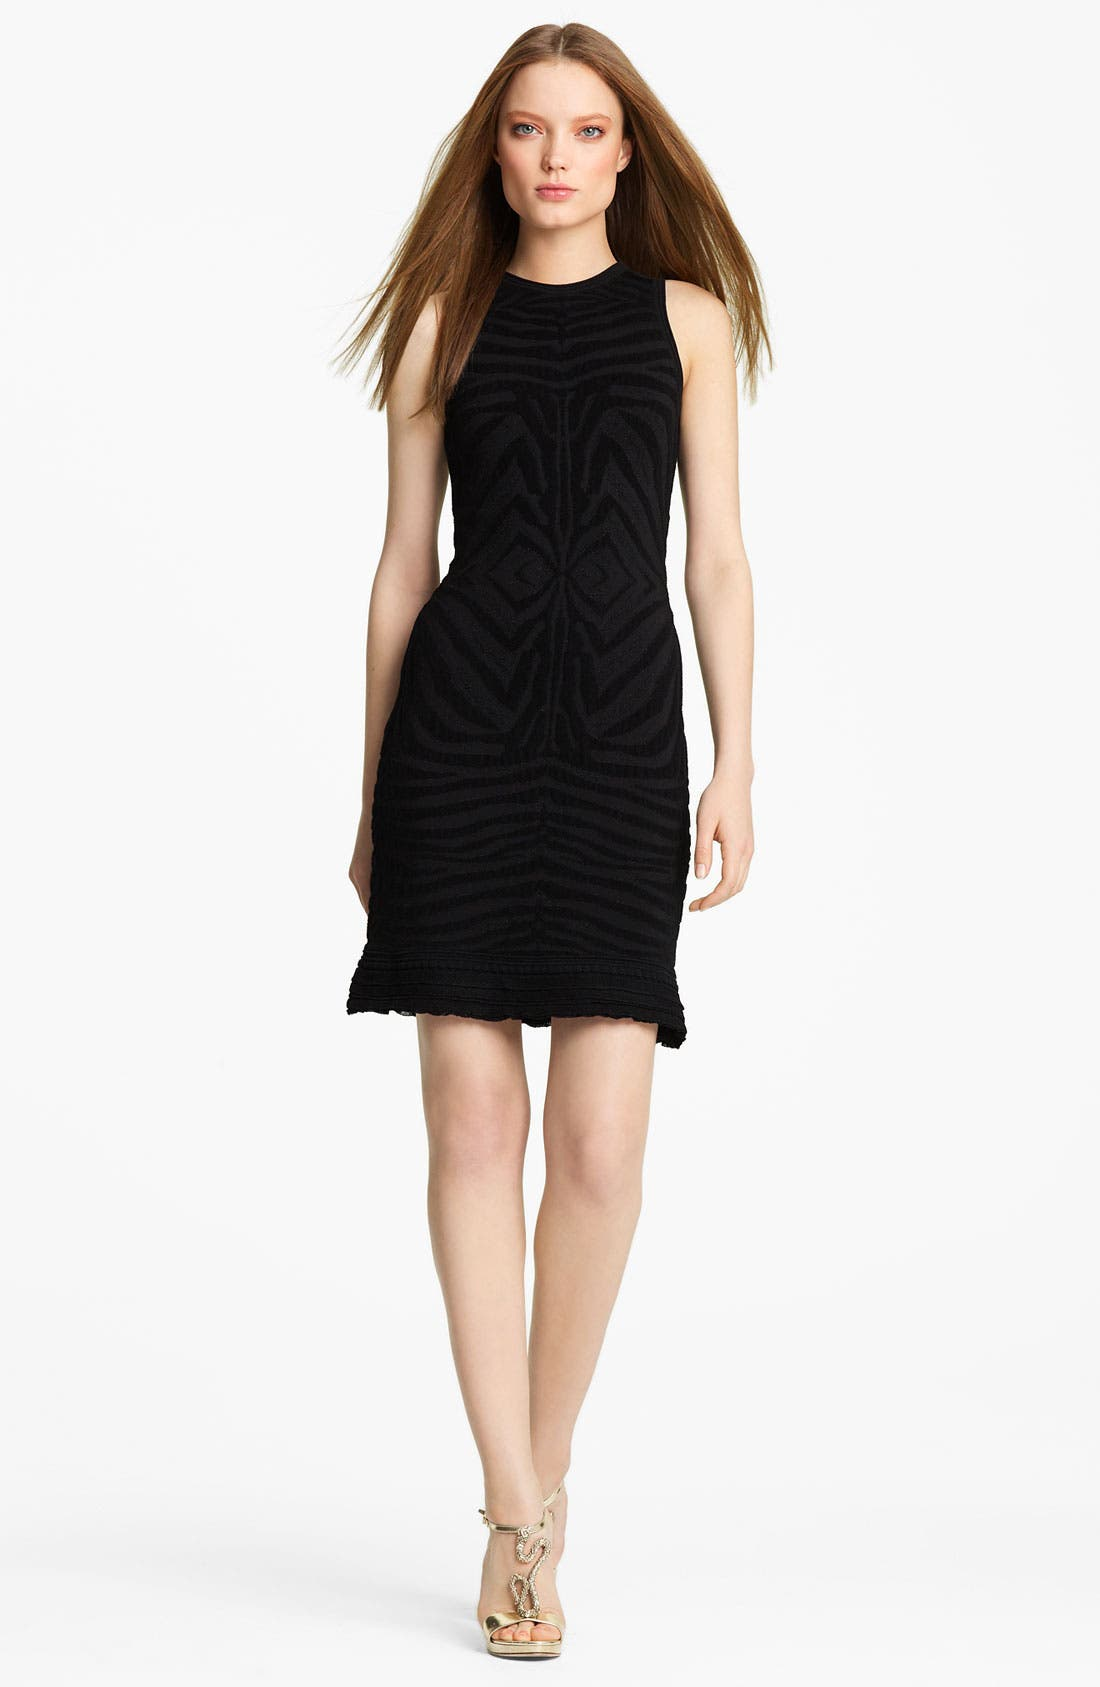 Main Image - Roberto Cavalli Zebra Knit Dress